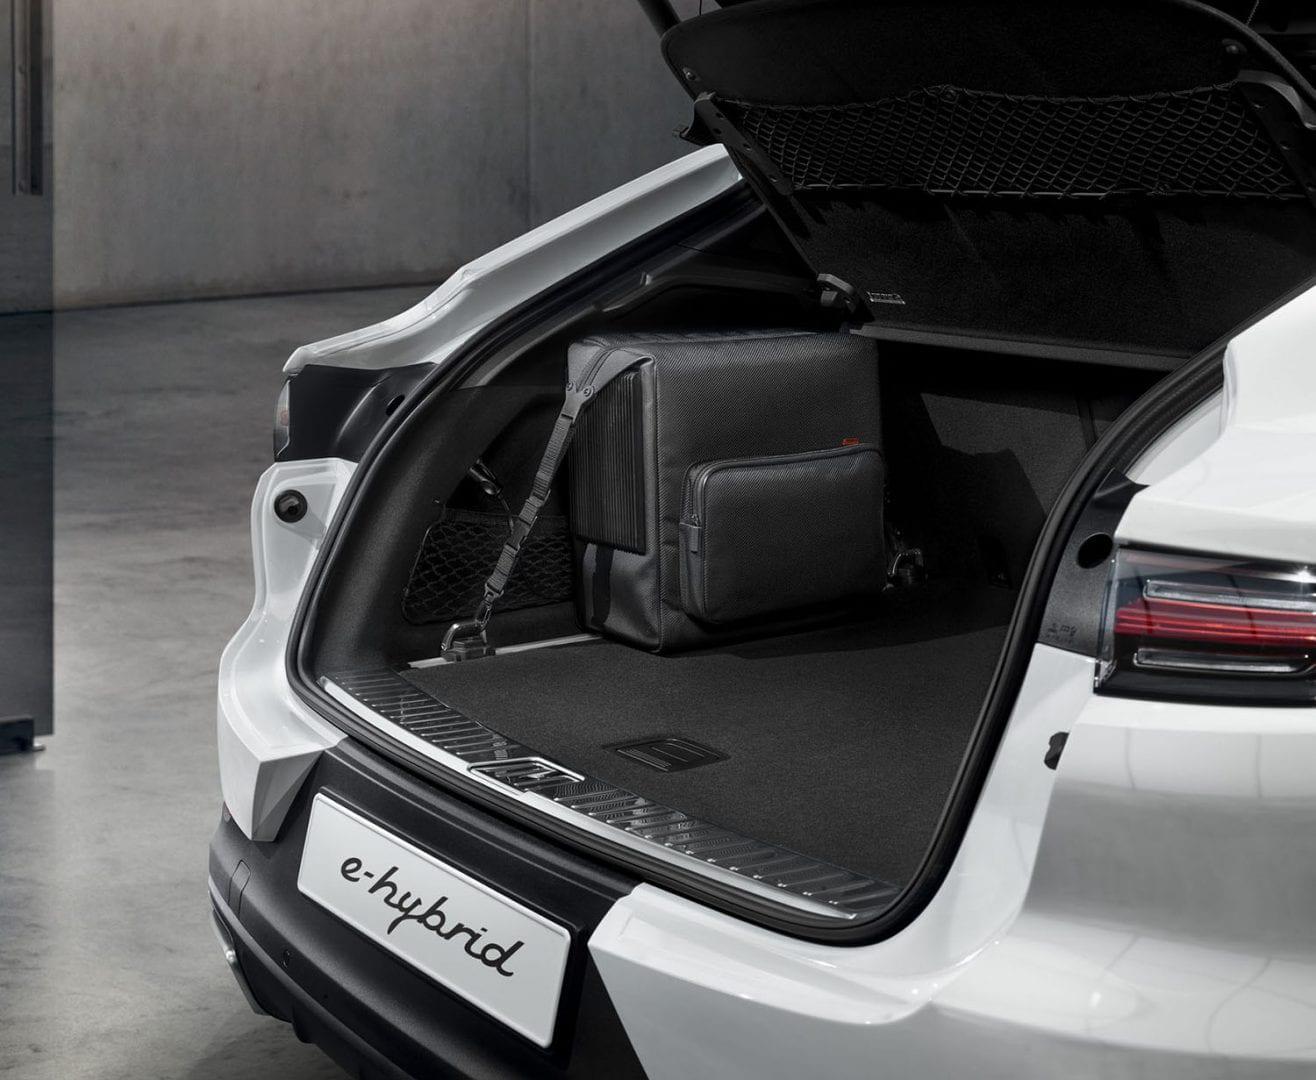 Porsche Cayenne E-Hybridin tavaratila.